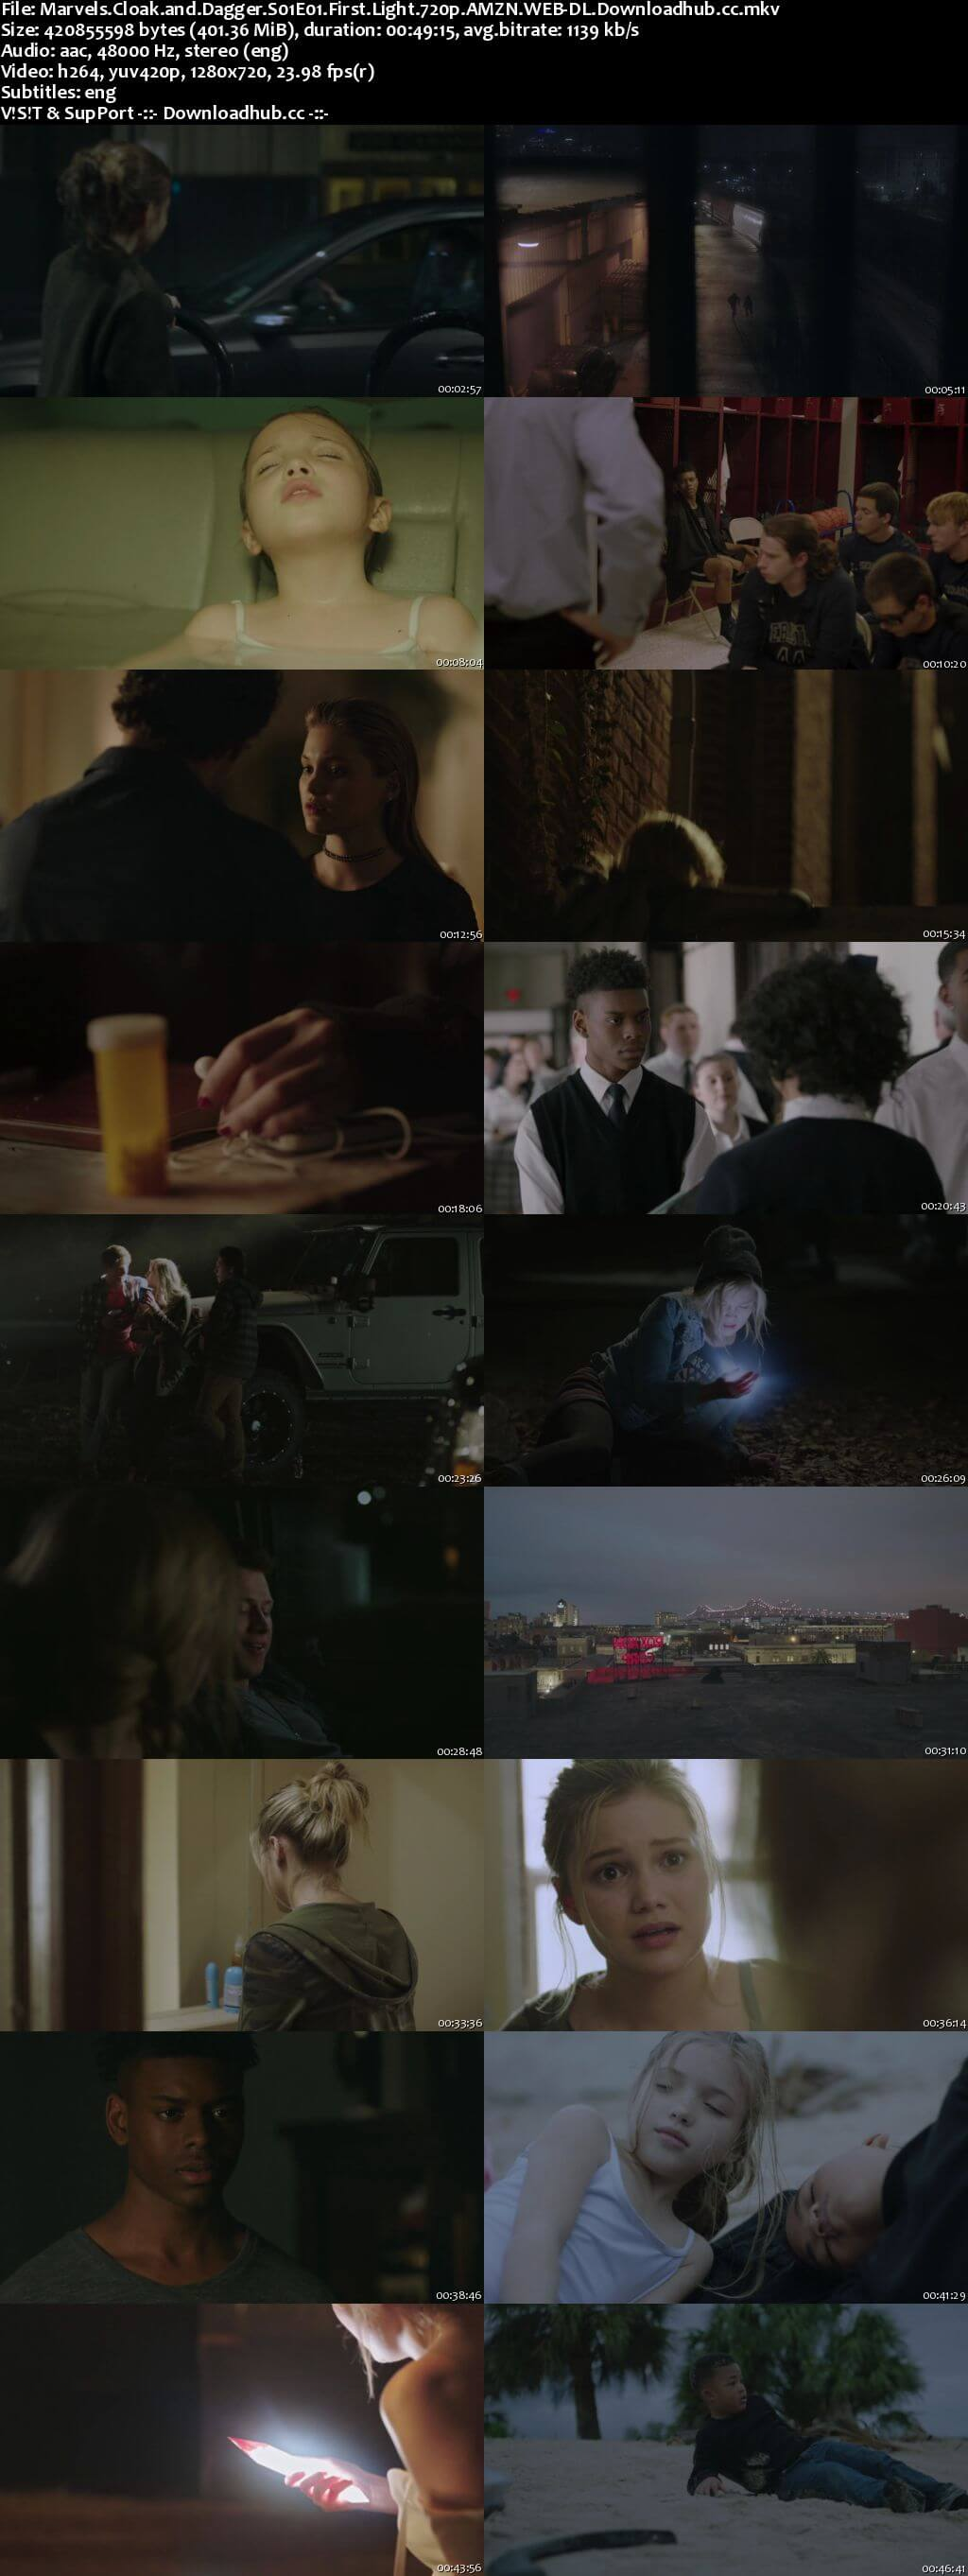 Cloak & Dagger S01E01 400MB WEB-DL 720p ESubs